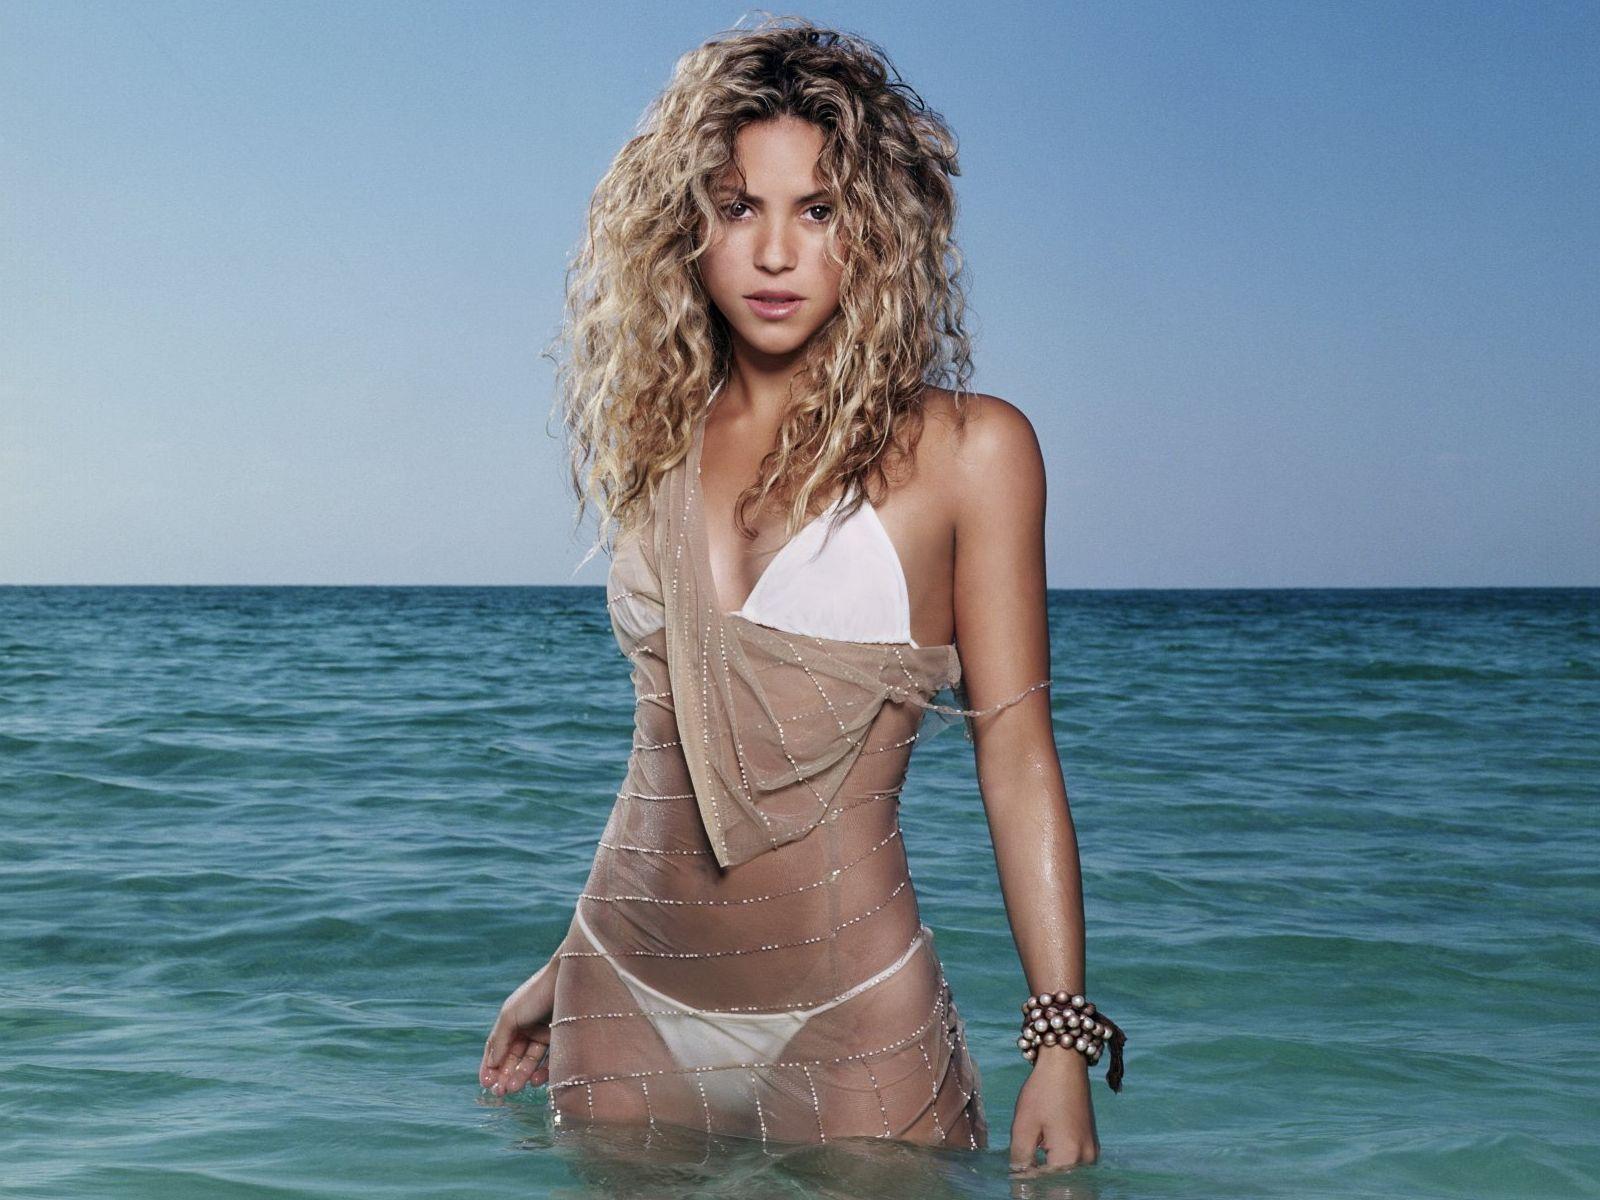 http://3.bp.blogspot.com/_83miS7TrWDY/TGCHaWuZrwI/AAAAAAAABFY/V8Bvu5-45zY/s1600/Shakira_bikini.jpg